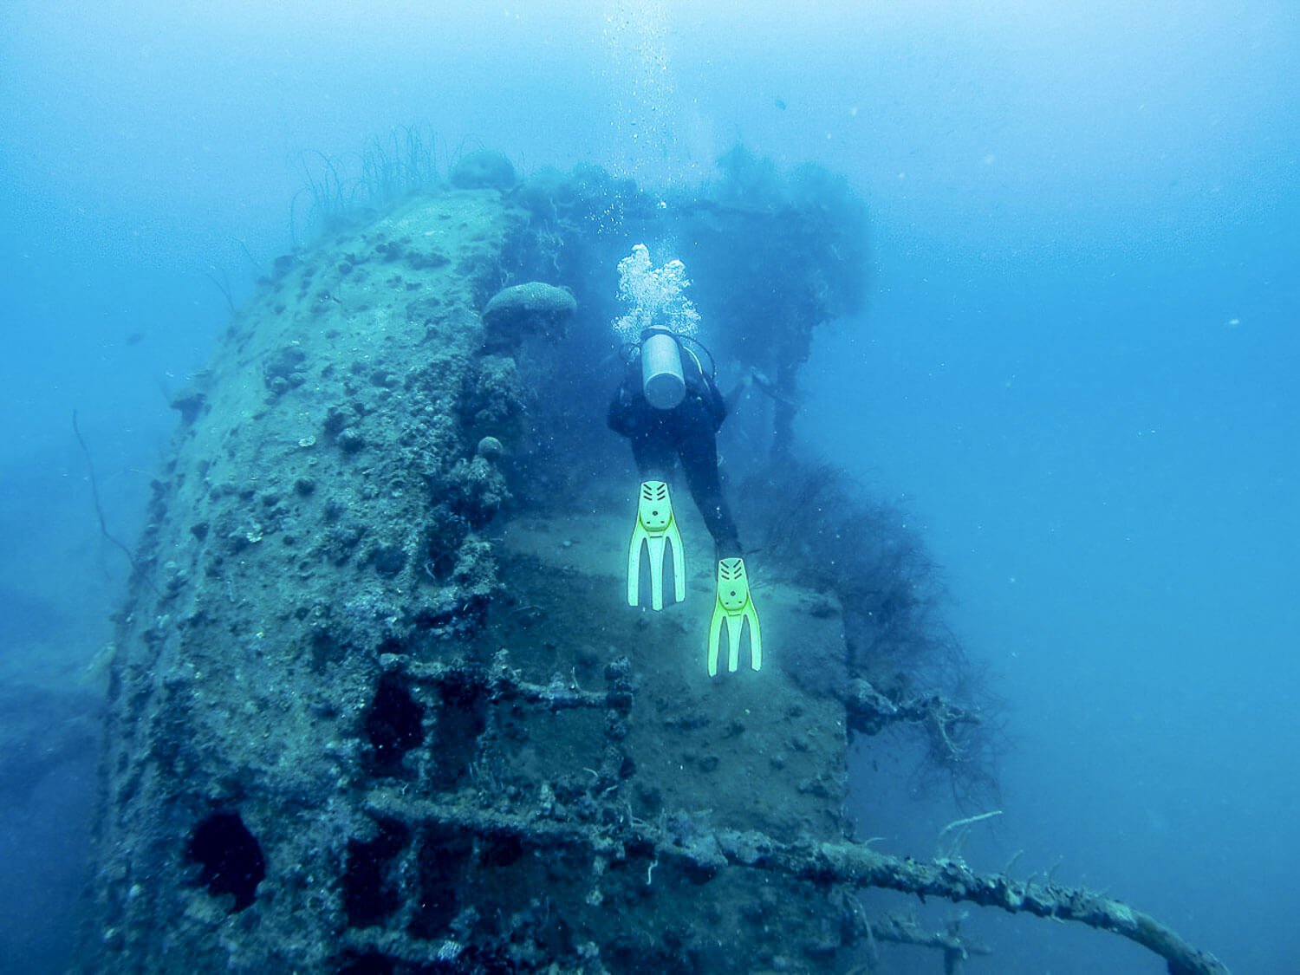 Foto da Proa do navio japonês naufragado - Coron Filipinas